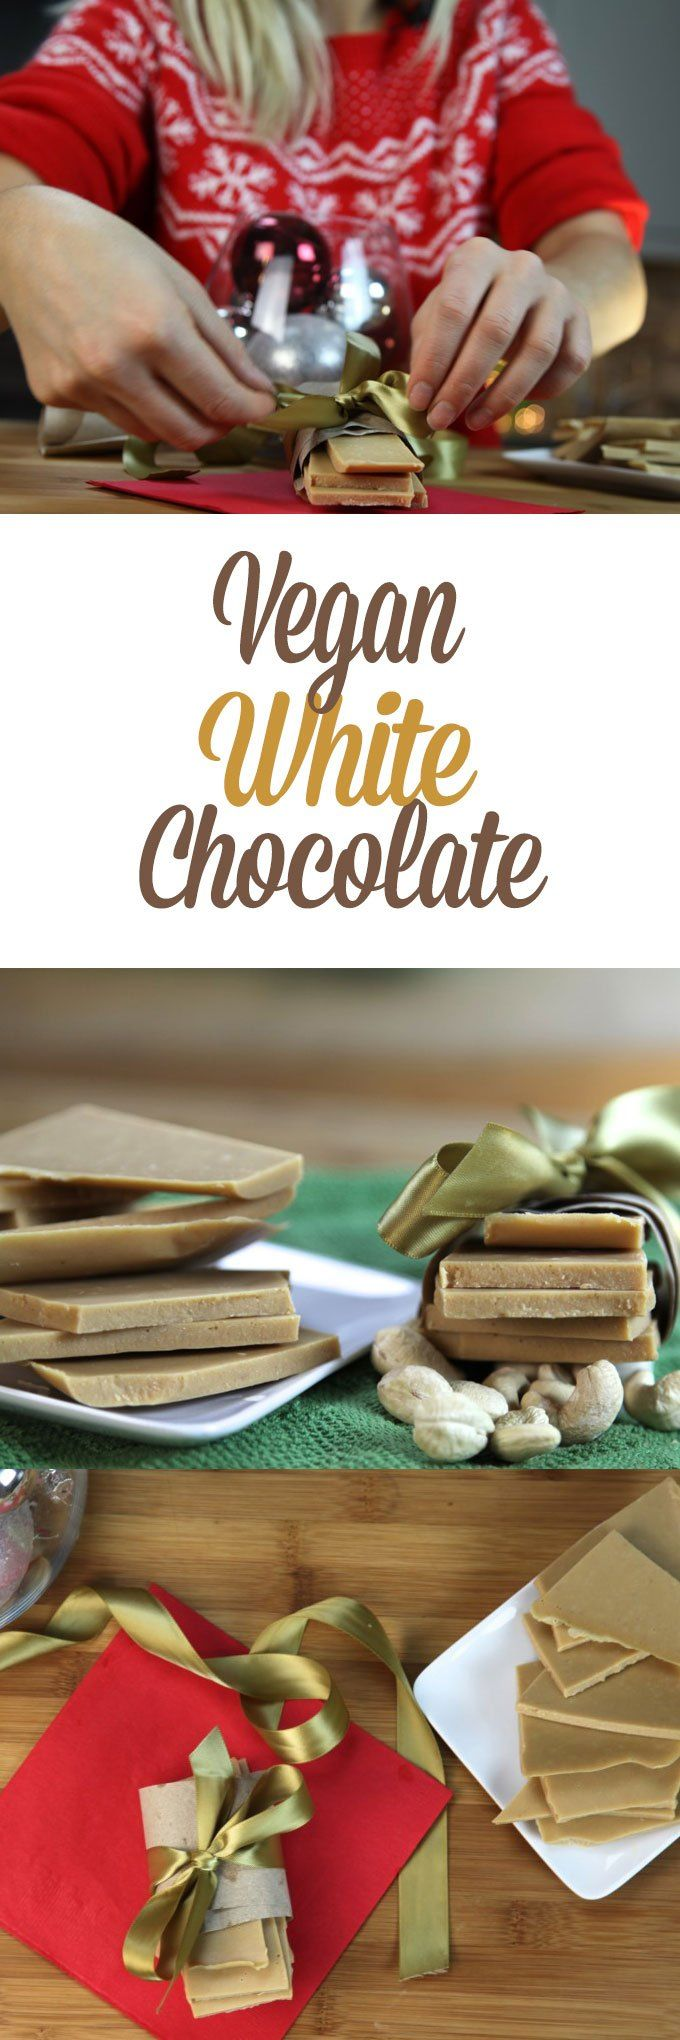 Best 20+ Vegan white chocolate ideas on Pinterest | Subway healthy ...